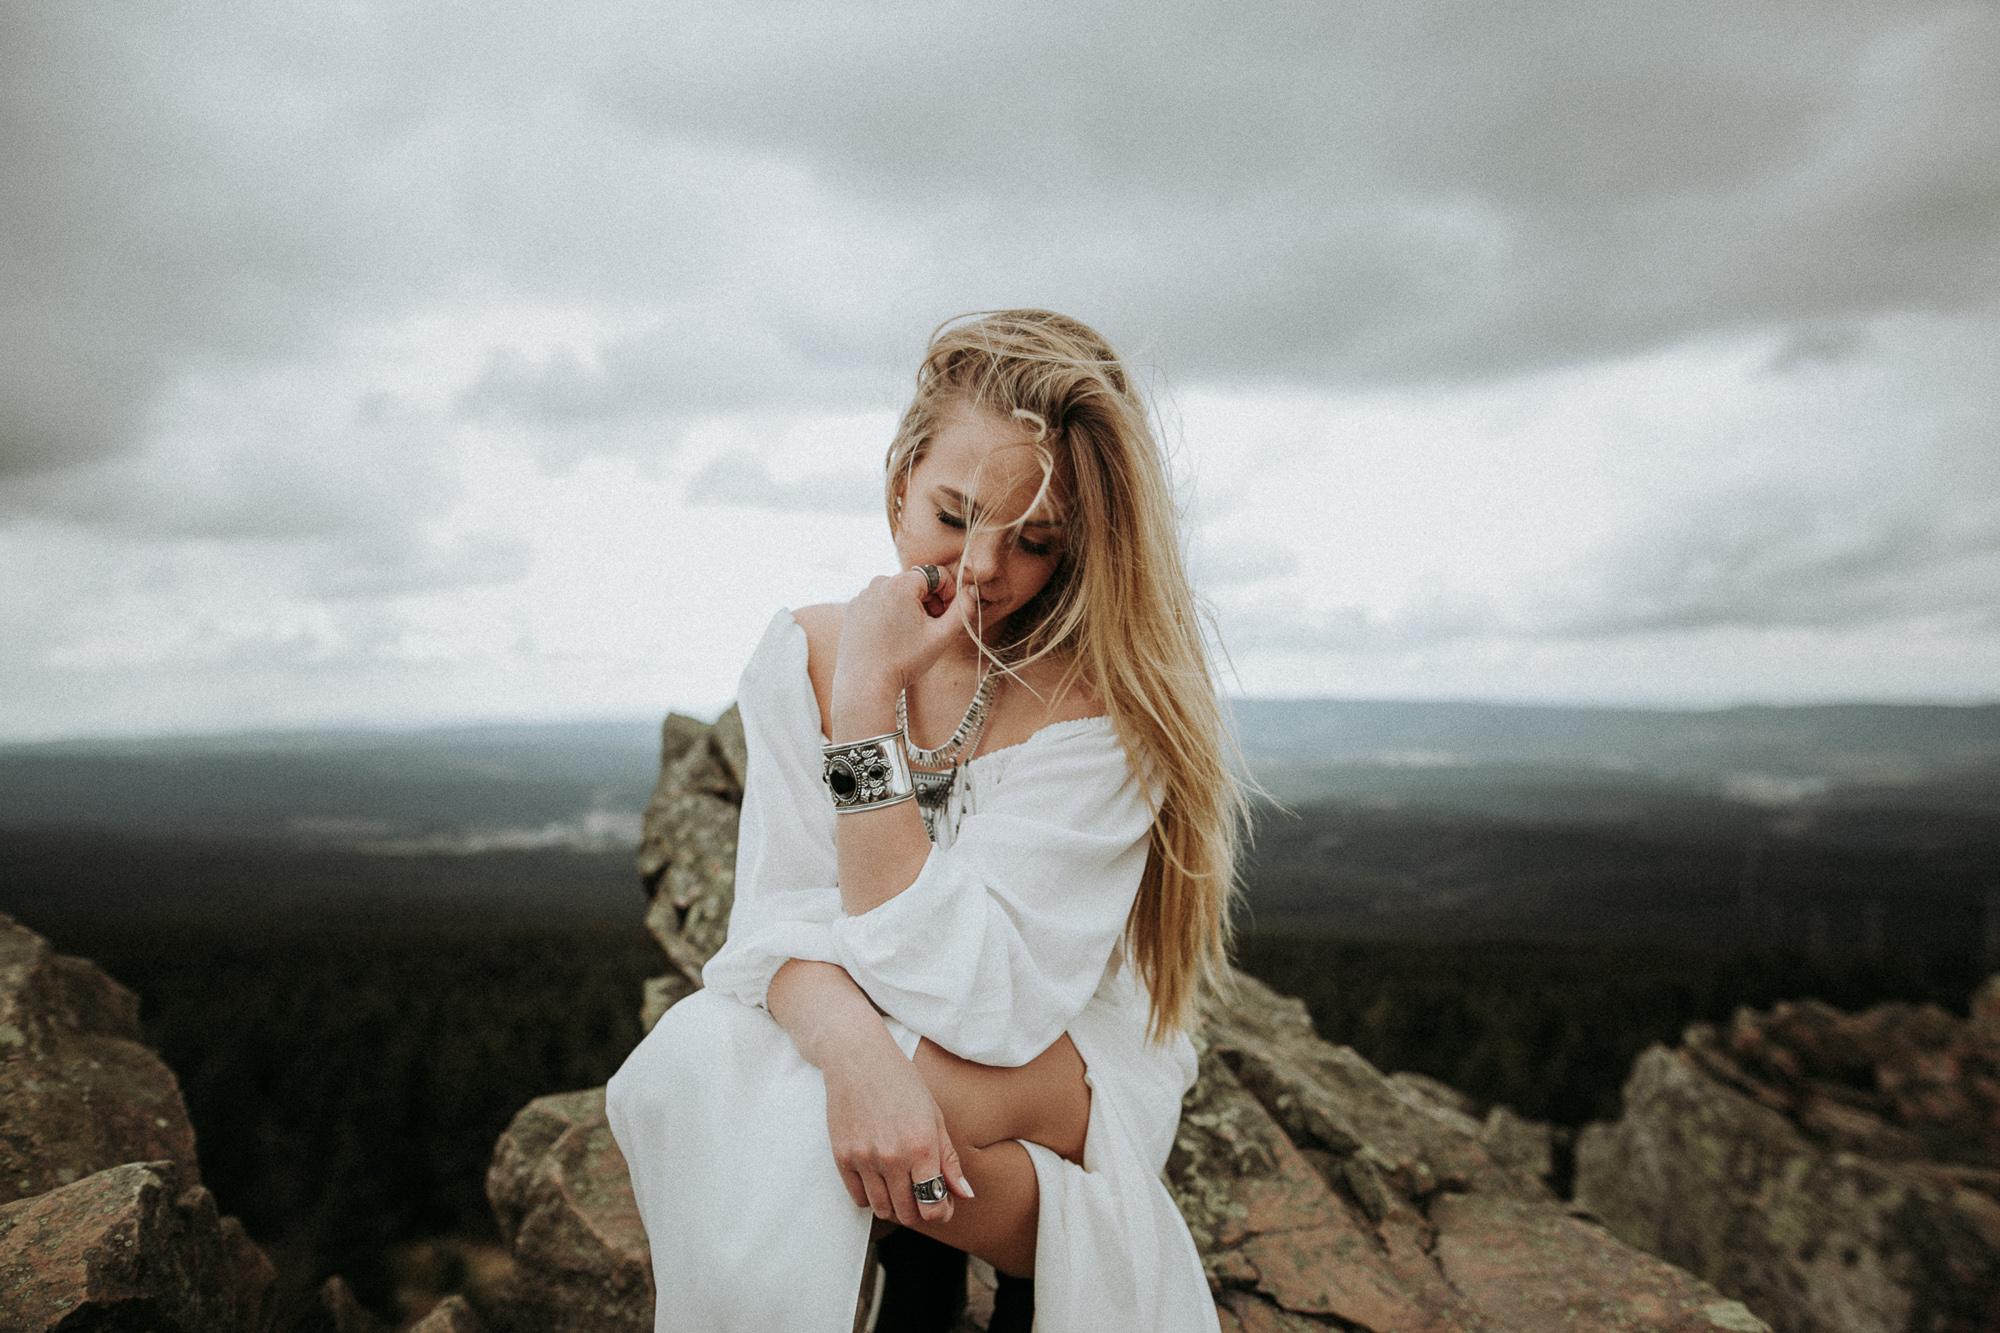 intothewild_julia_dimi_40